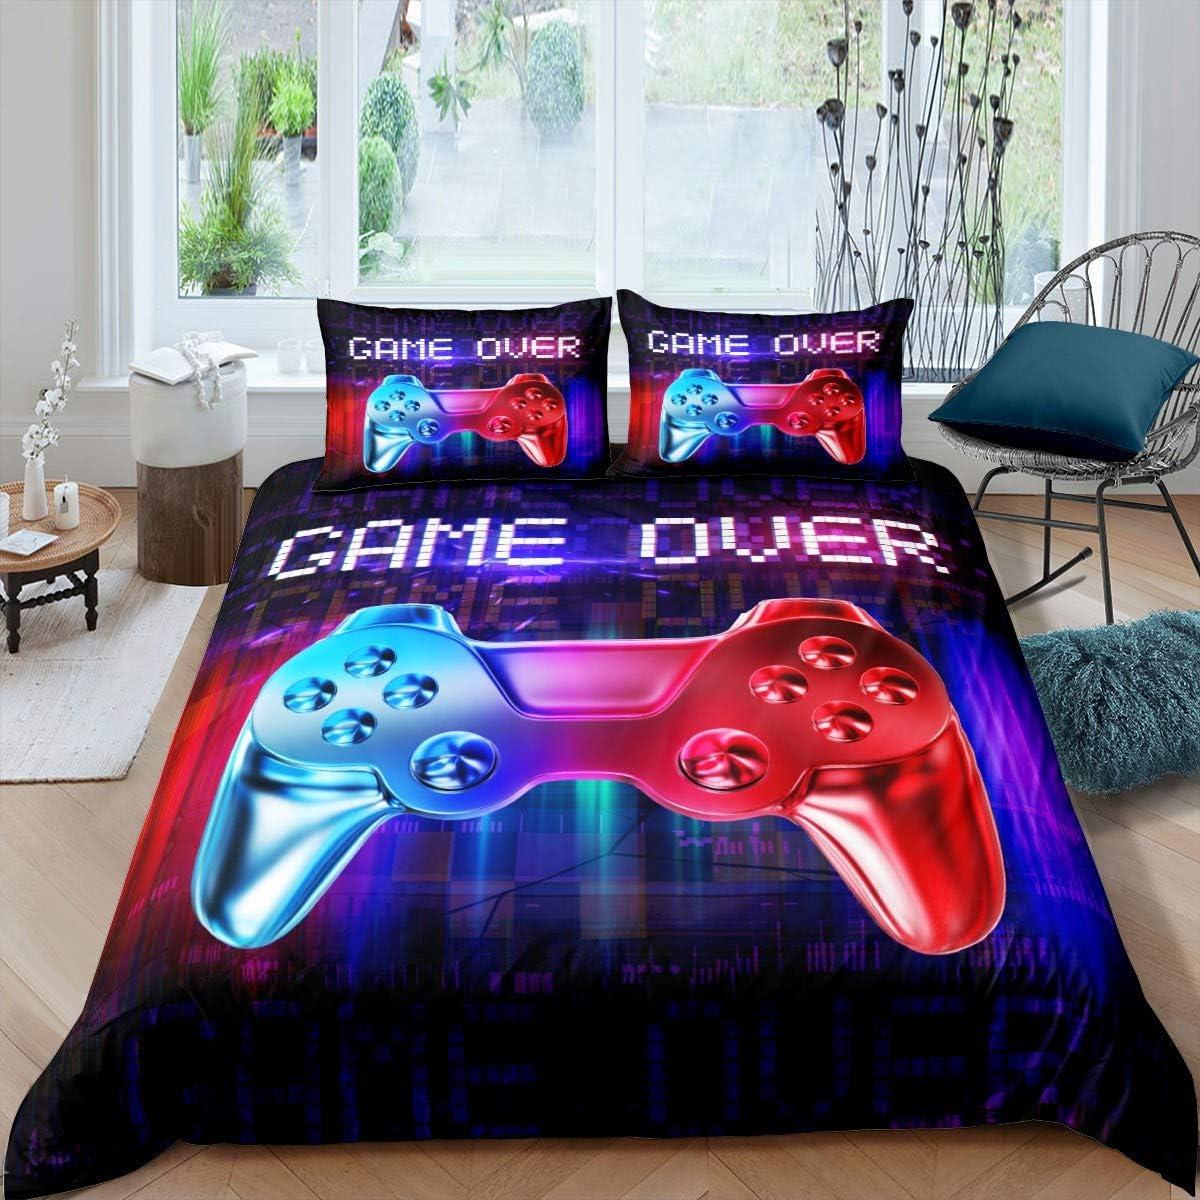 Feelyou Gaming Bedding Set Kids Boys Gamer 直営店 Duvet Cover Games スーパーセール期間限定 Com